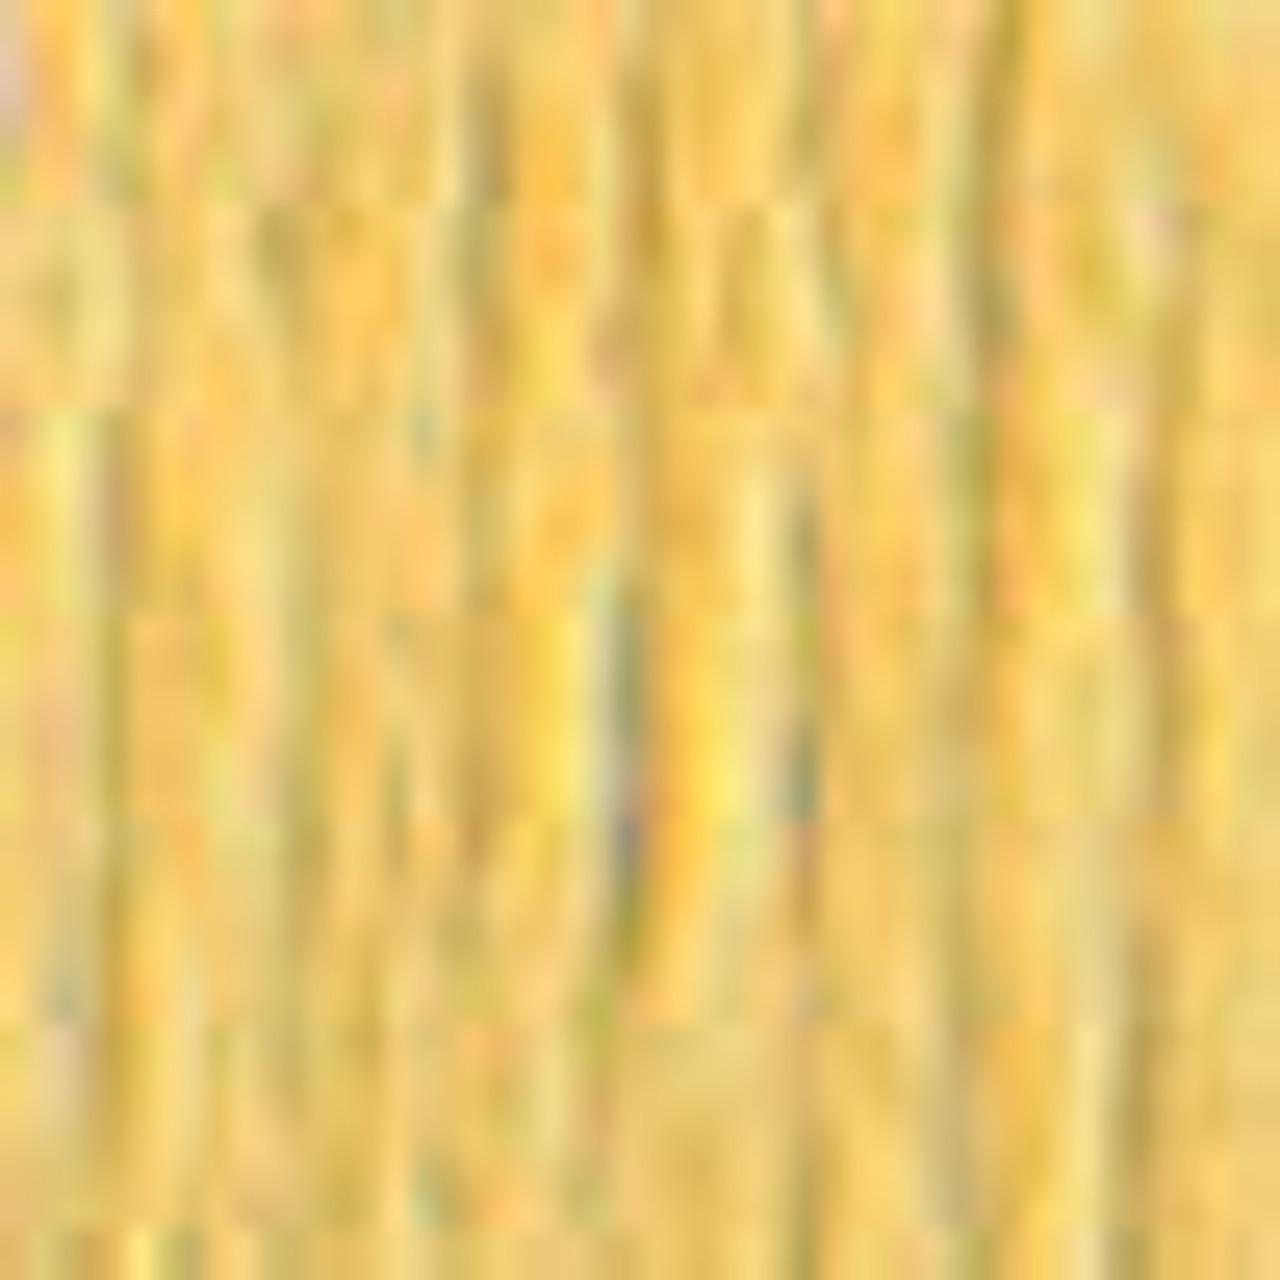 DMC # 3821 Straw Floss / Thread